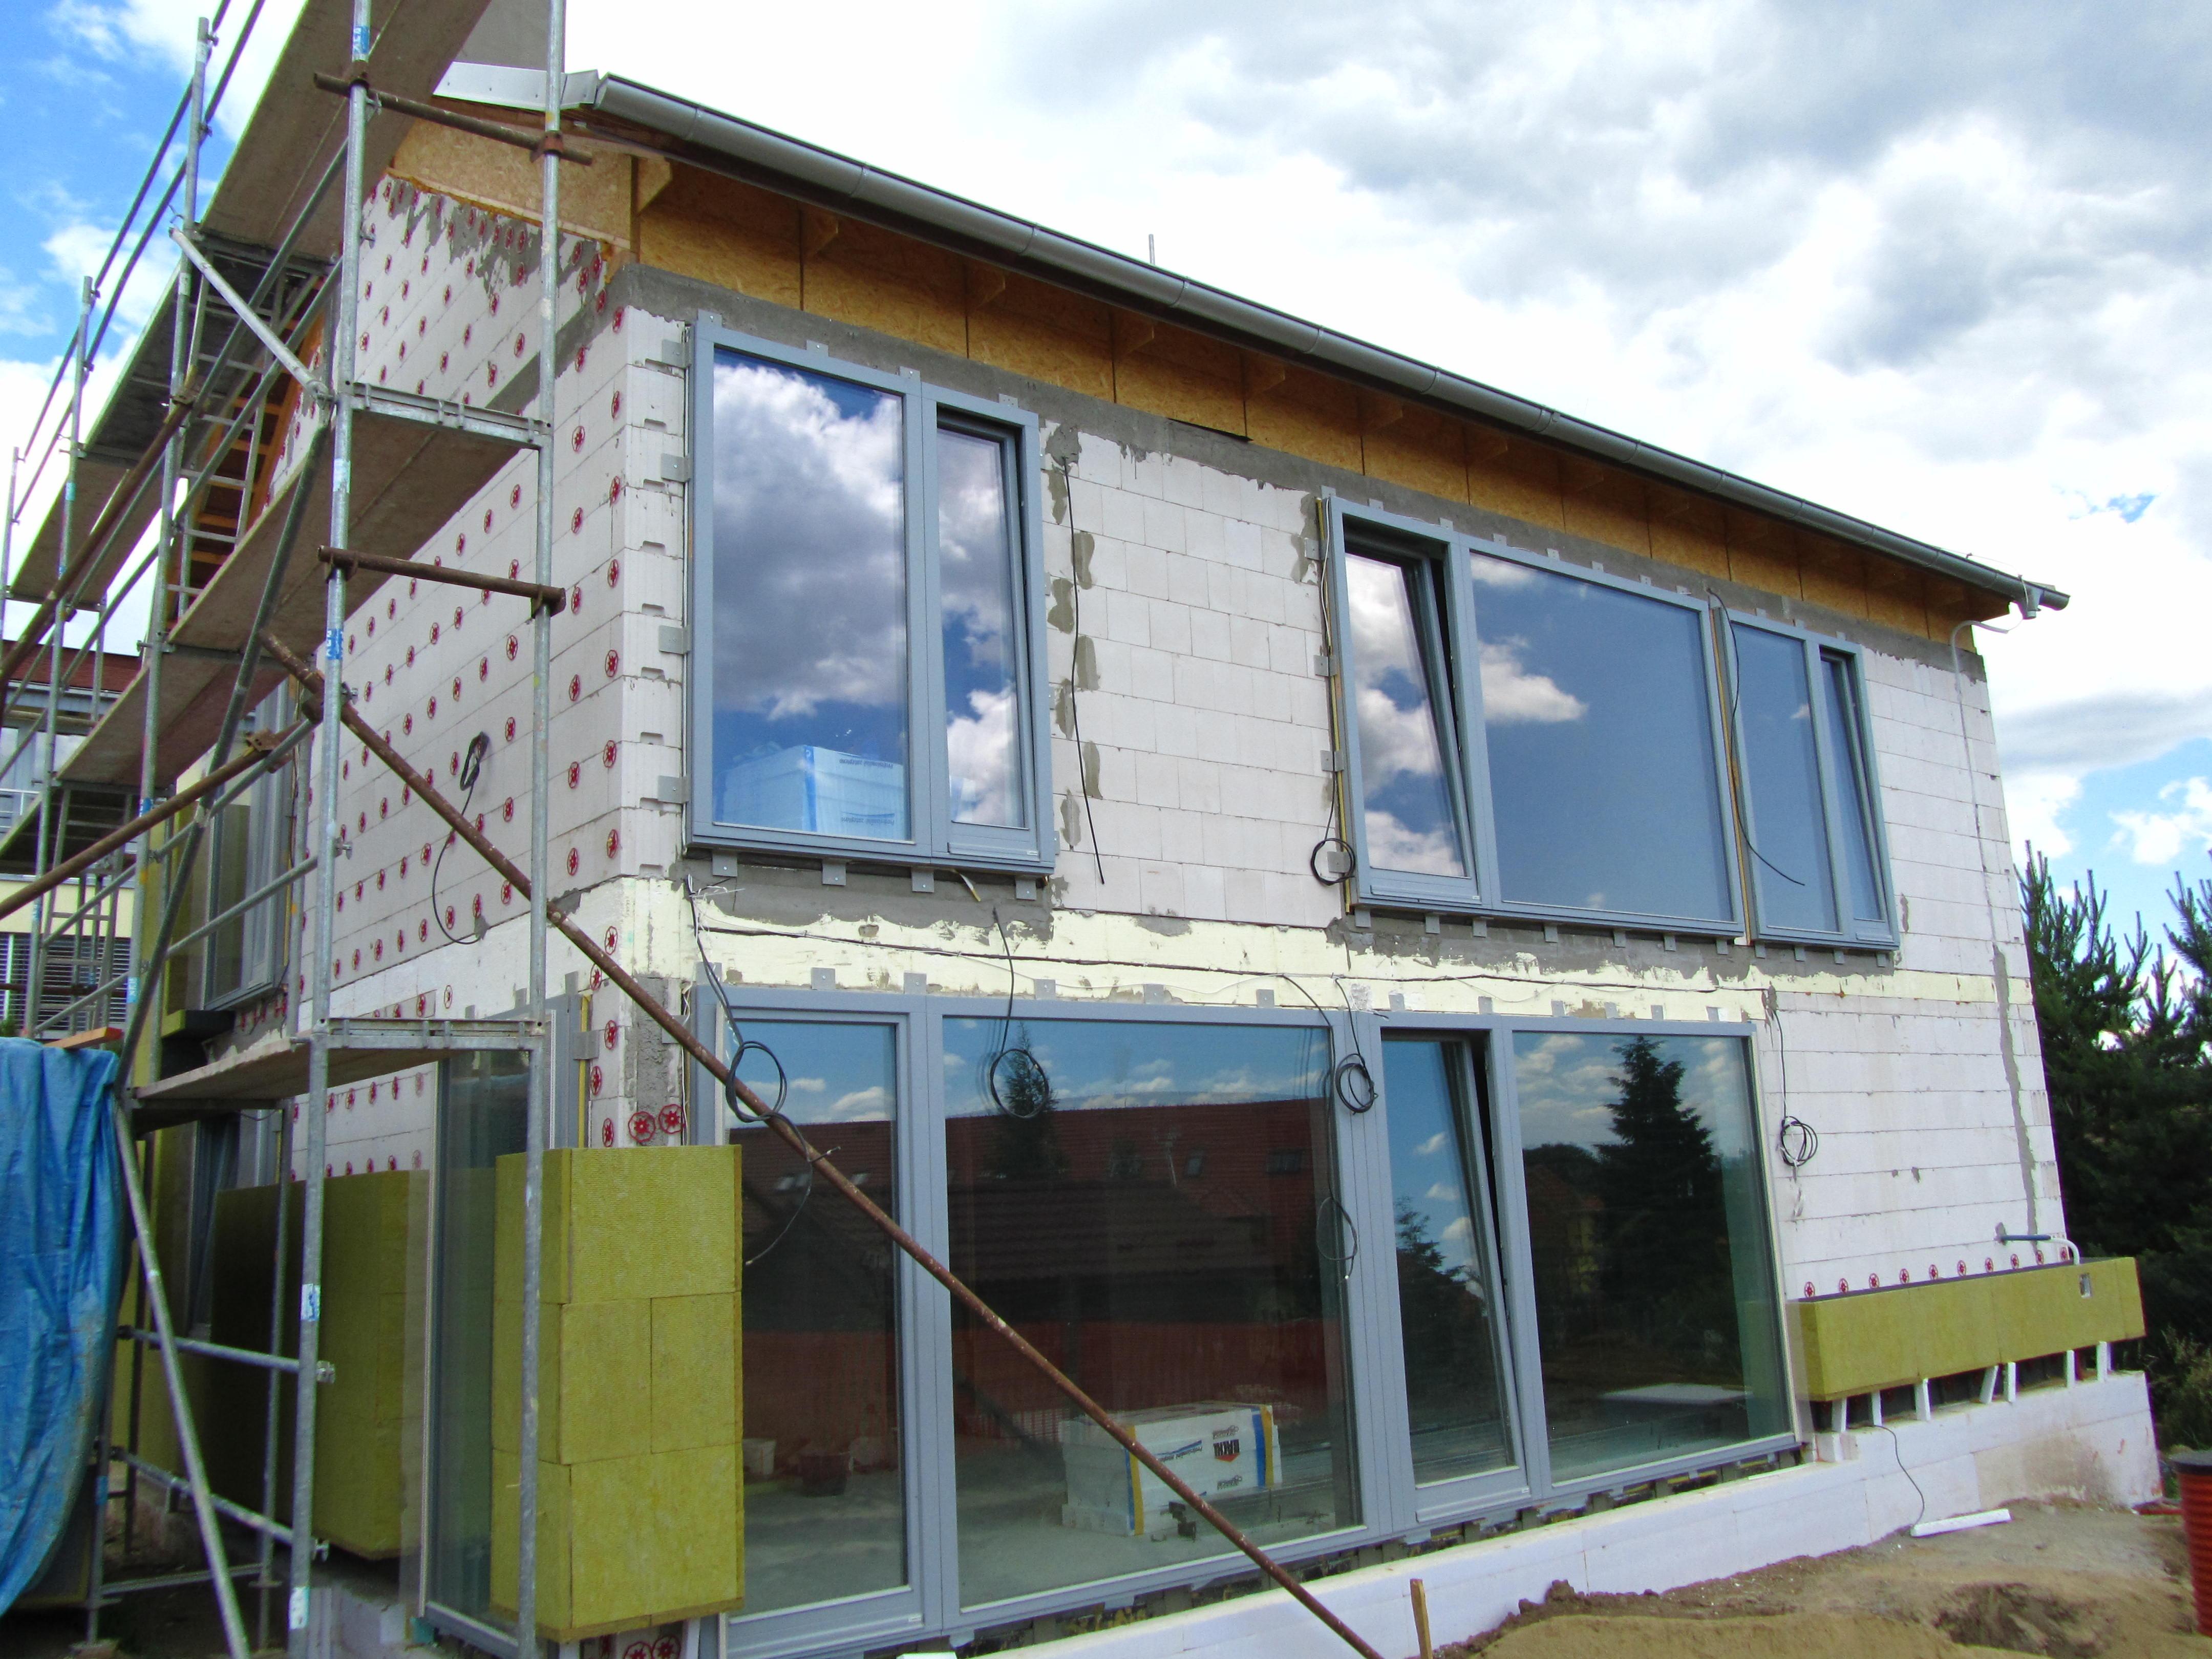 Kombinovaný izolant Isover Twinner pro úsporné rodinné i bytové domy